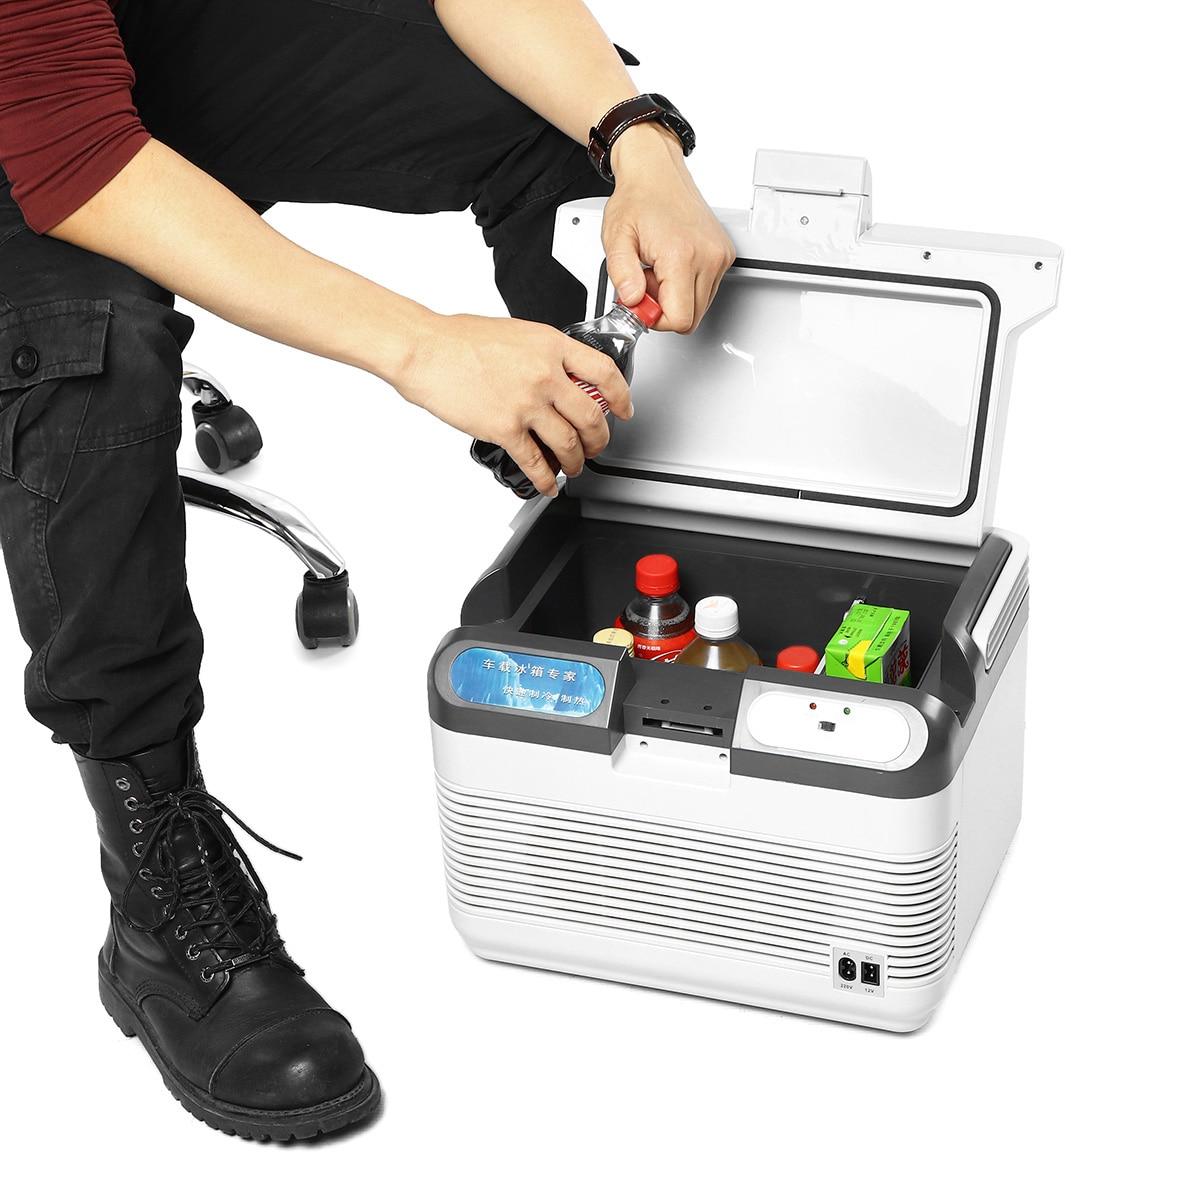 12L Refrigerator Dual-Use Home Car Refrigerators Mini Freezer 12V 60W Portable Ultra Quiet Cooling Heating Box Fridge For Travel